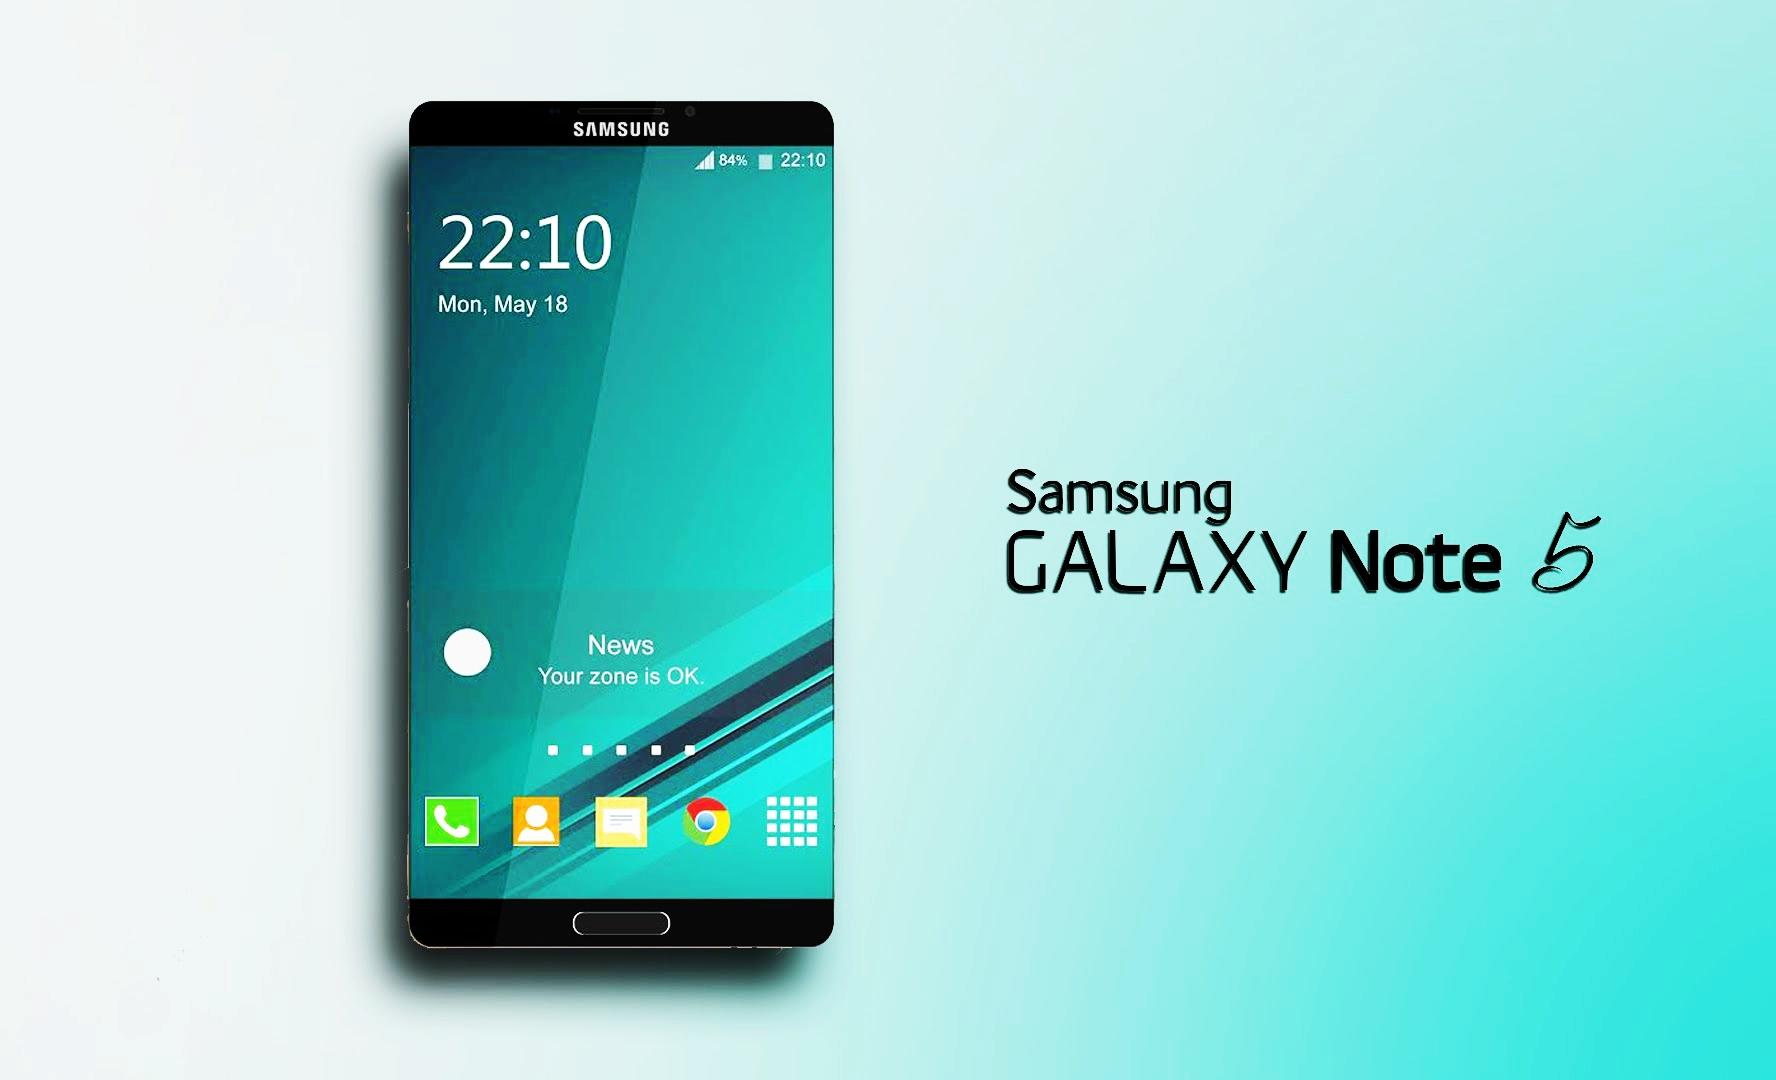 Nilai Performa Samsung Galaxy Note 5 dengan RAM 4 GB